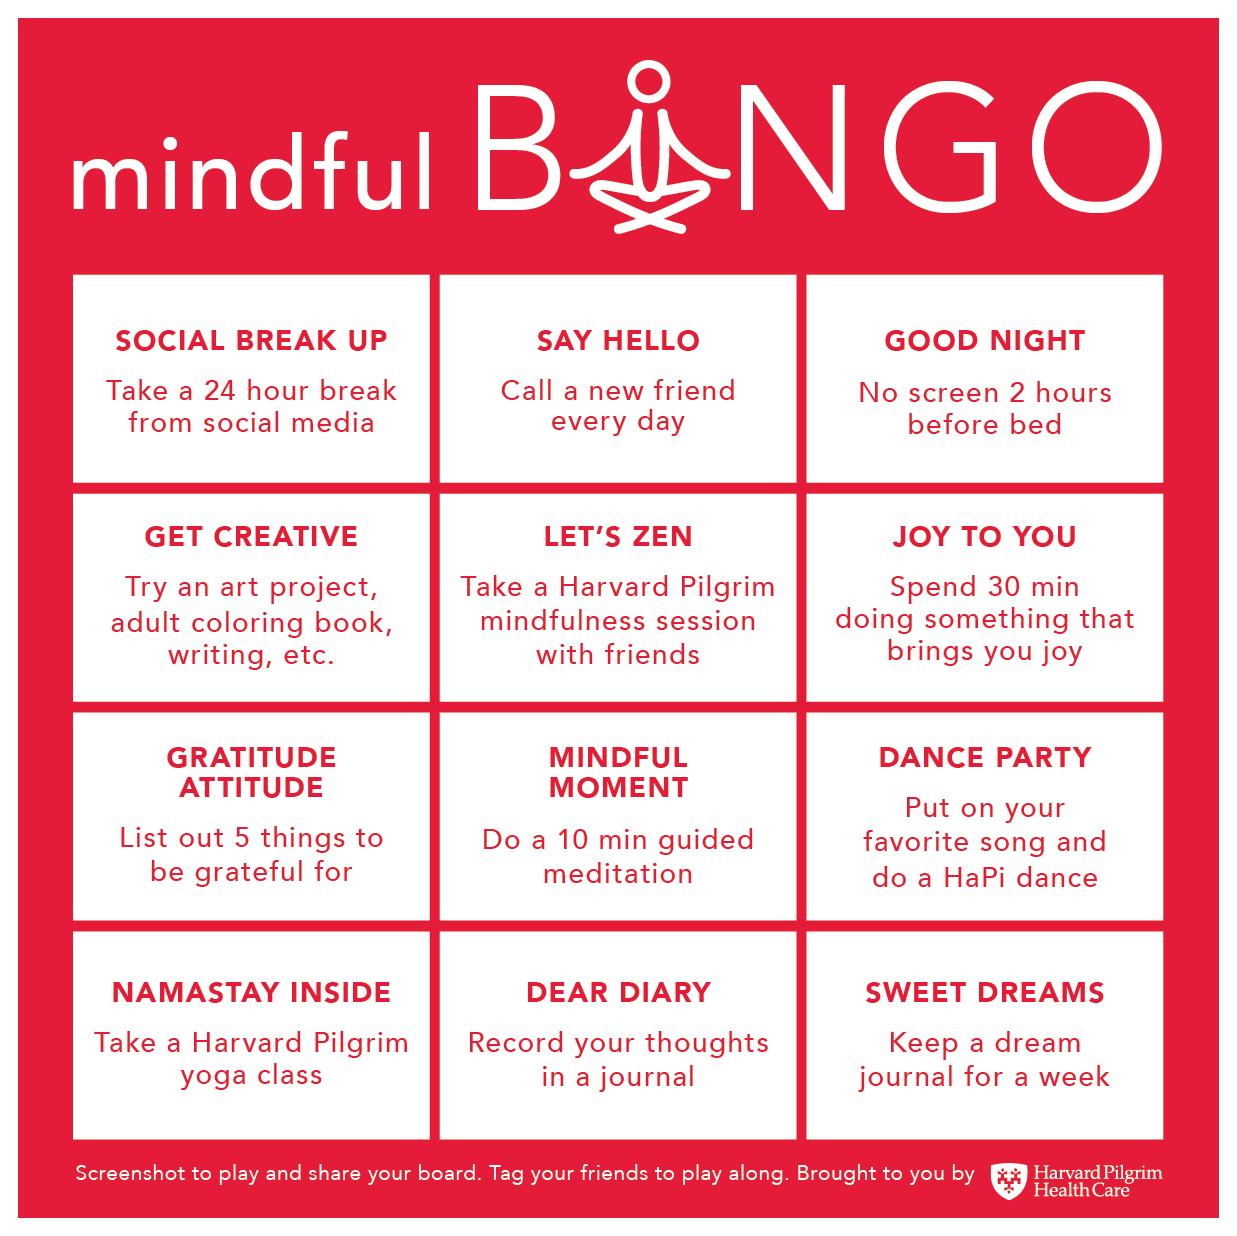 Mindful Bingo